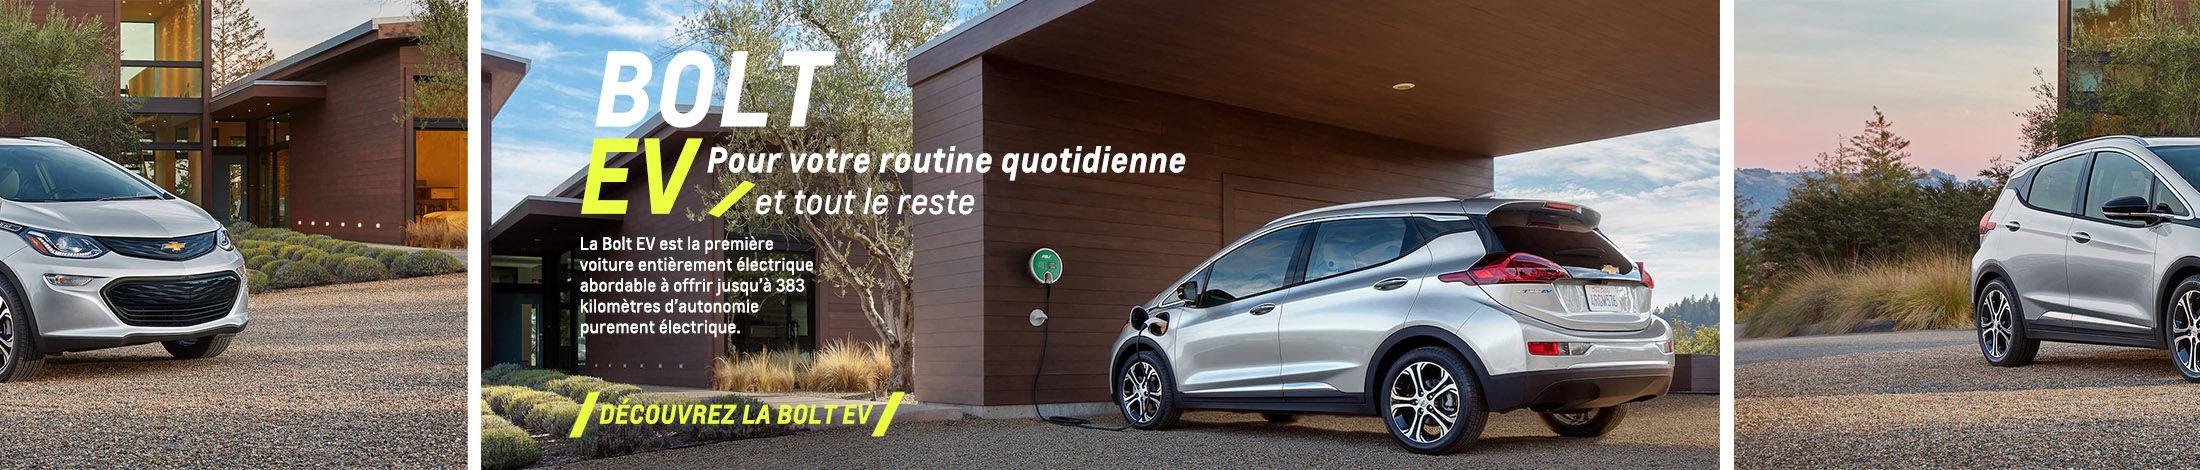 Bolt-EV Chevrolet 2019